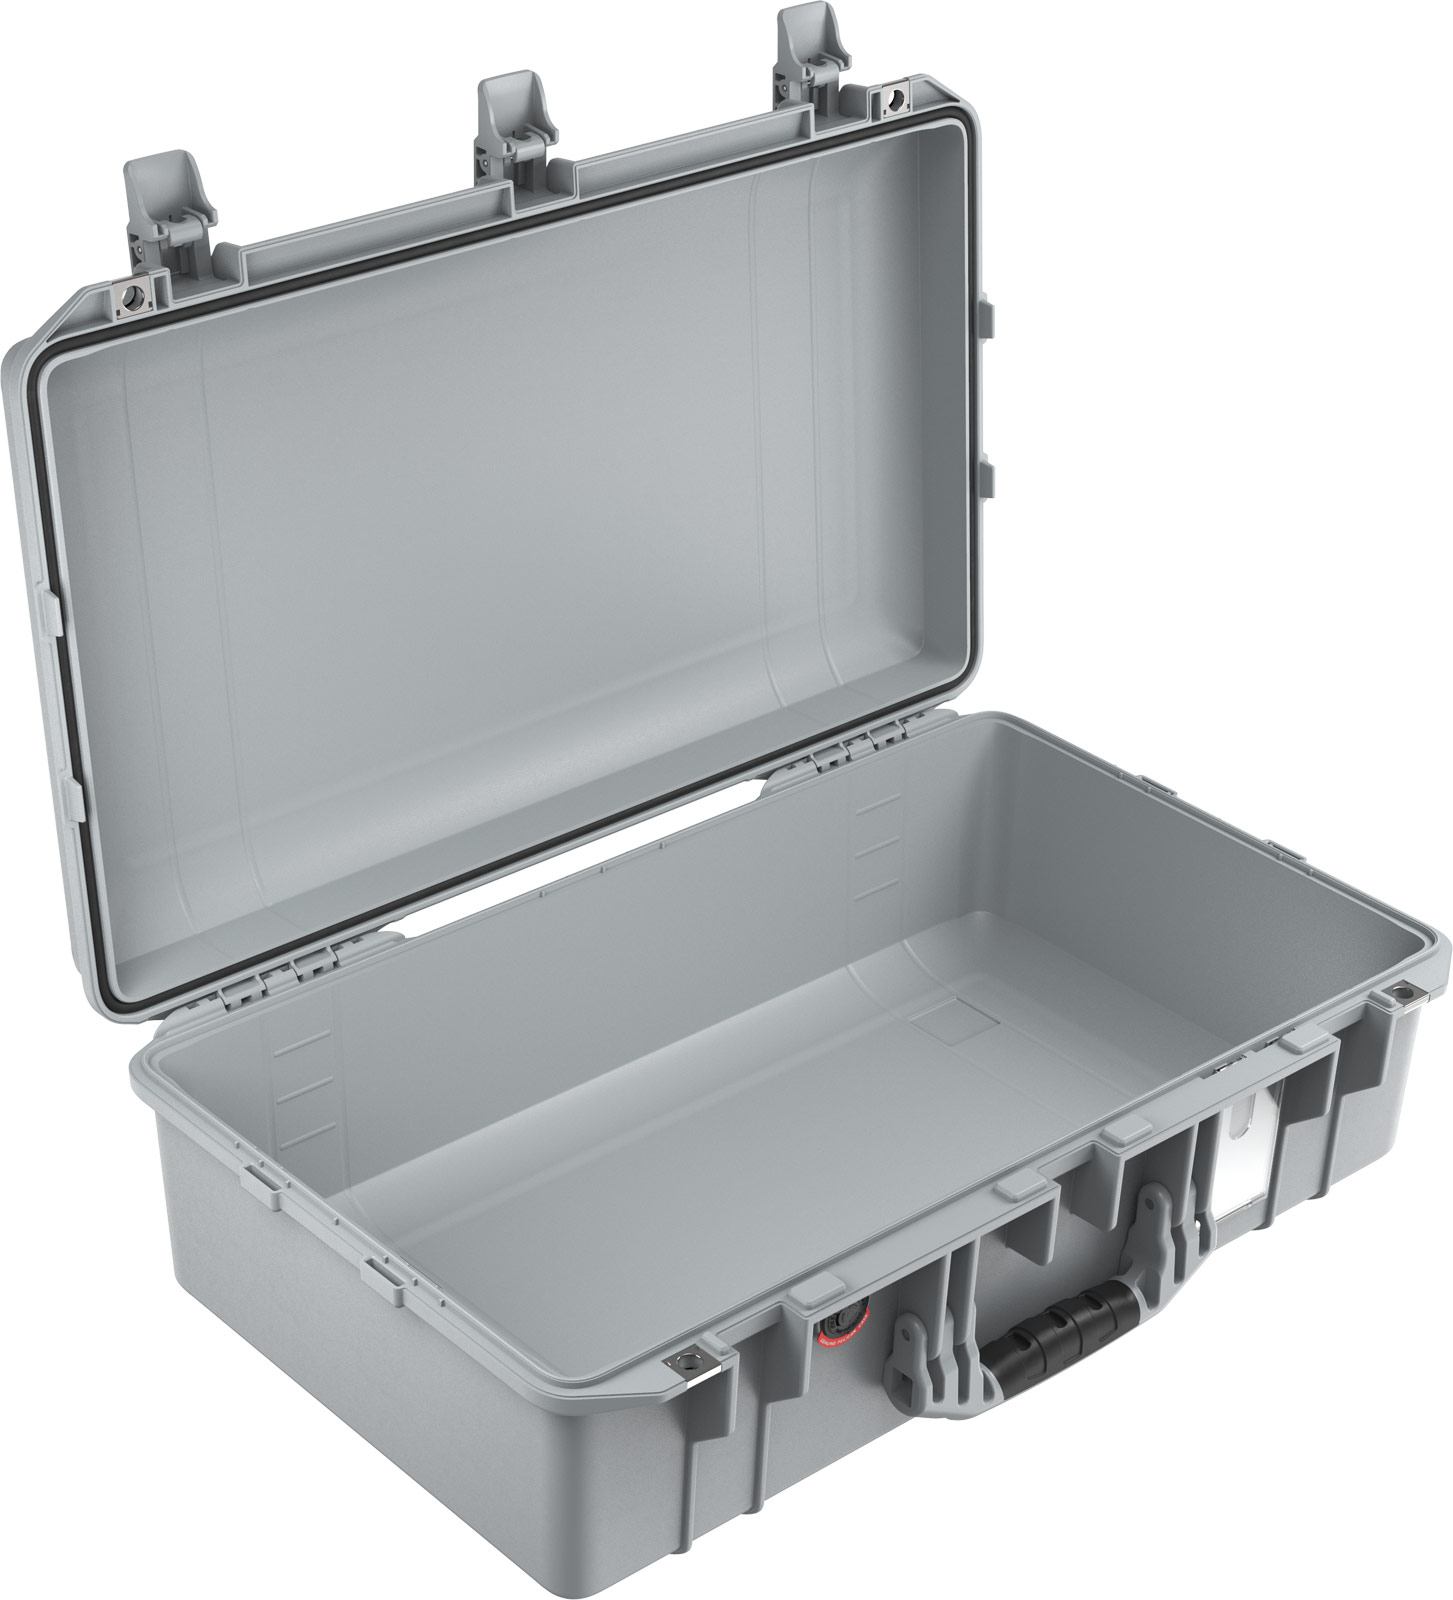 pelican air 1555 watertight silver photo case